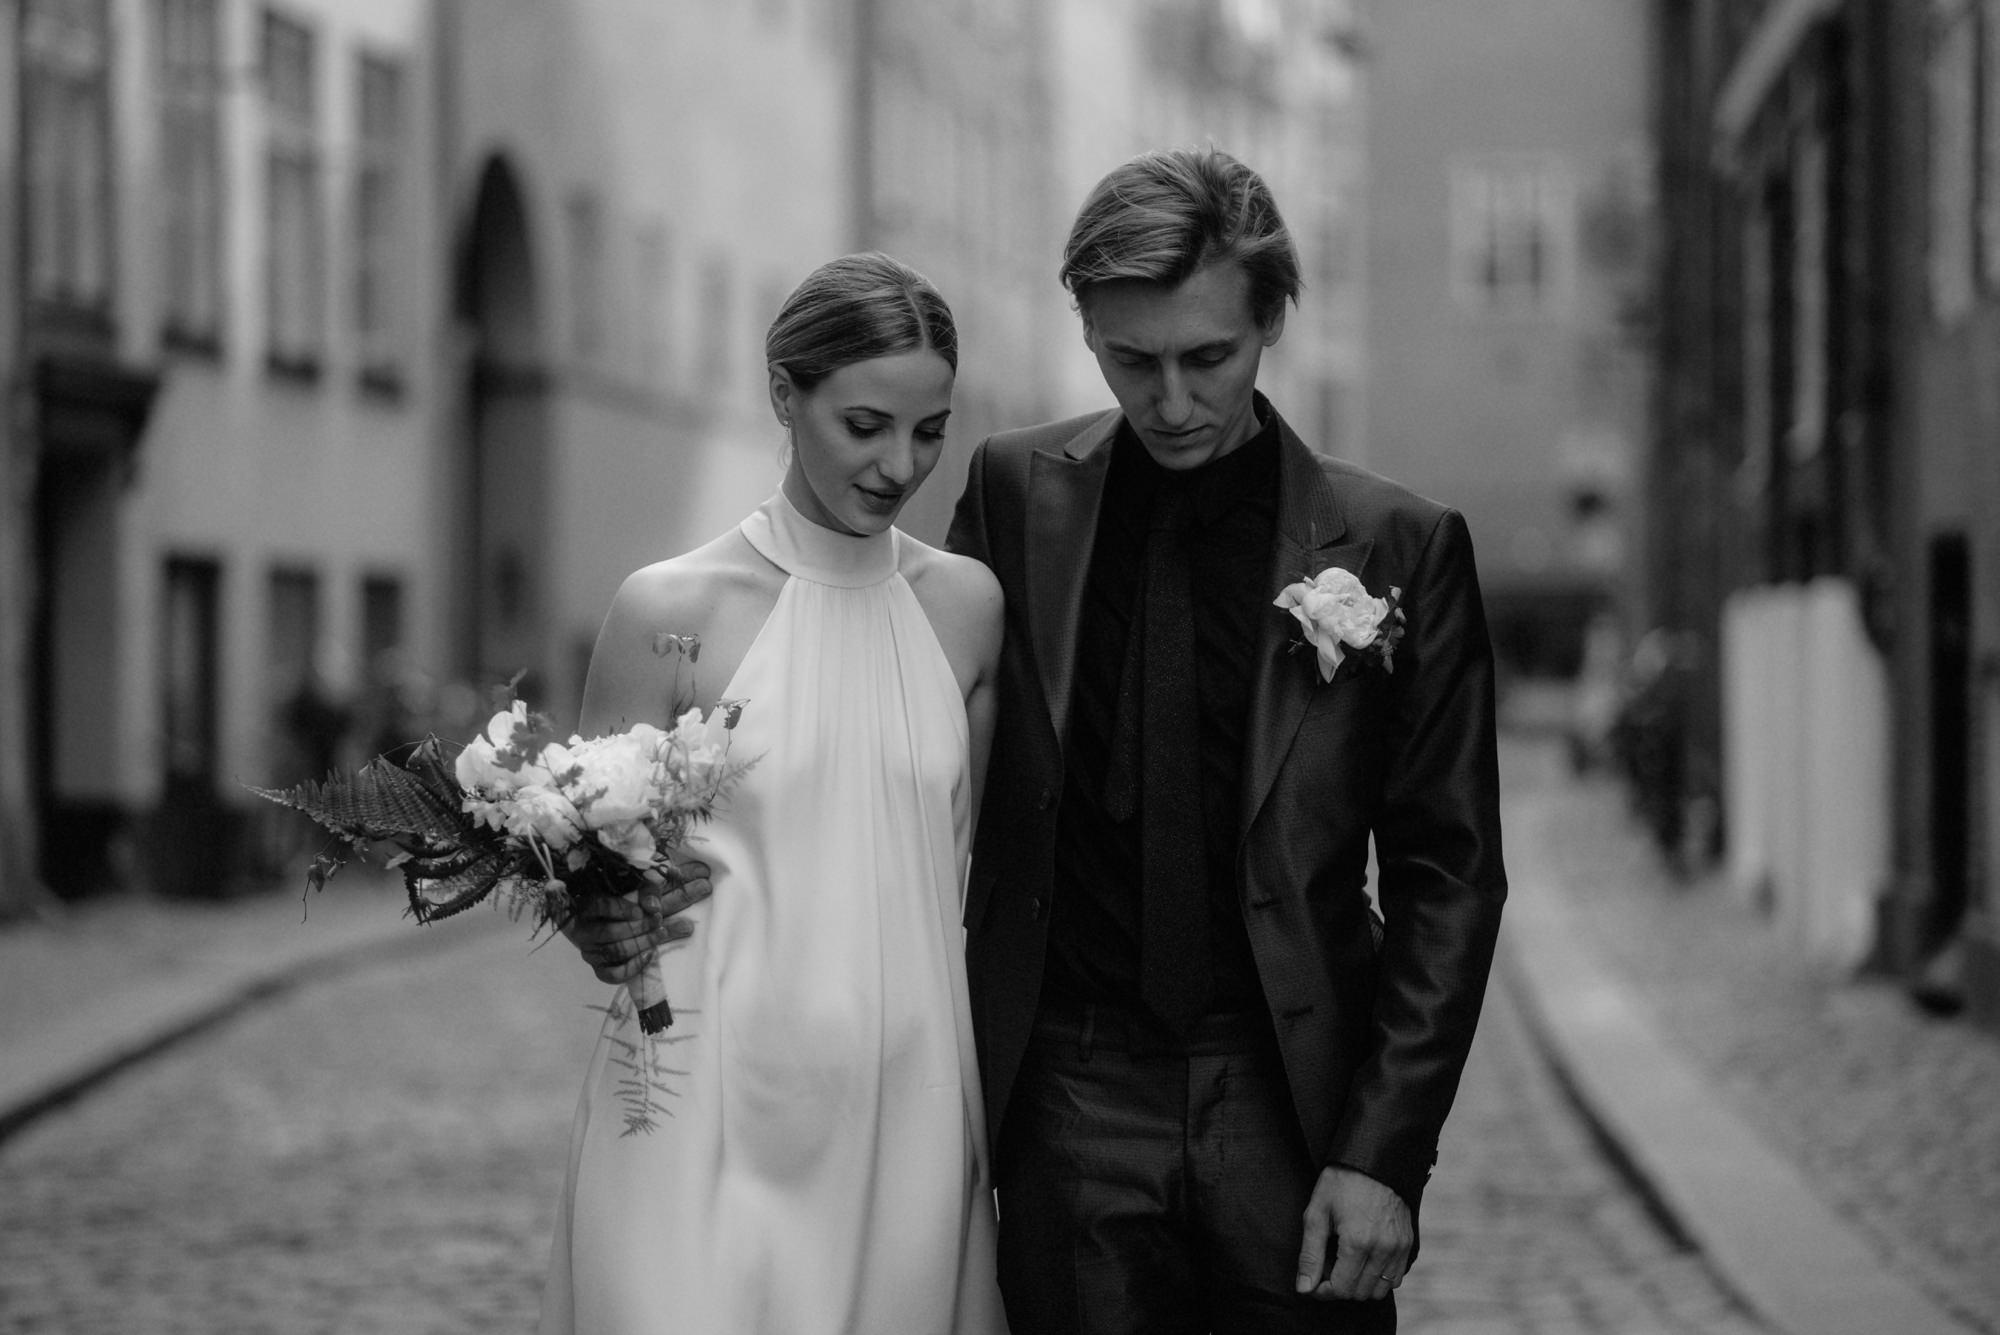 copenhagen wedding photography 0045 1